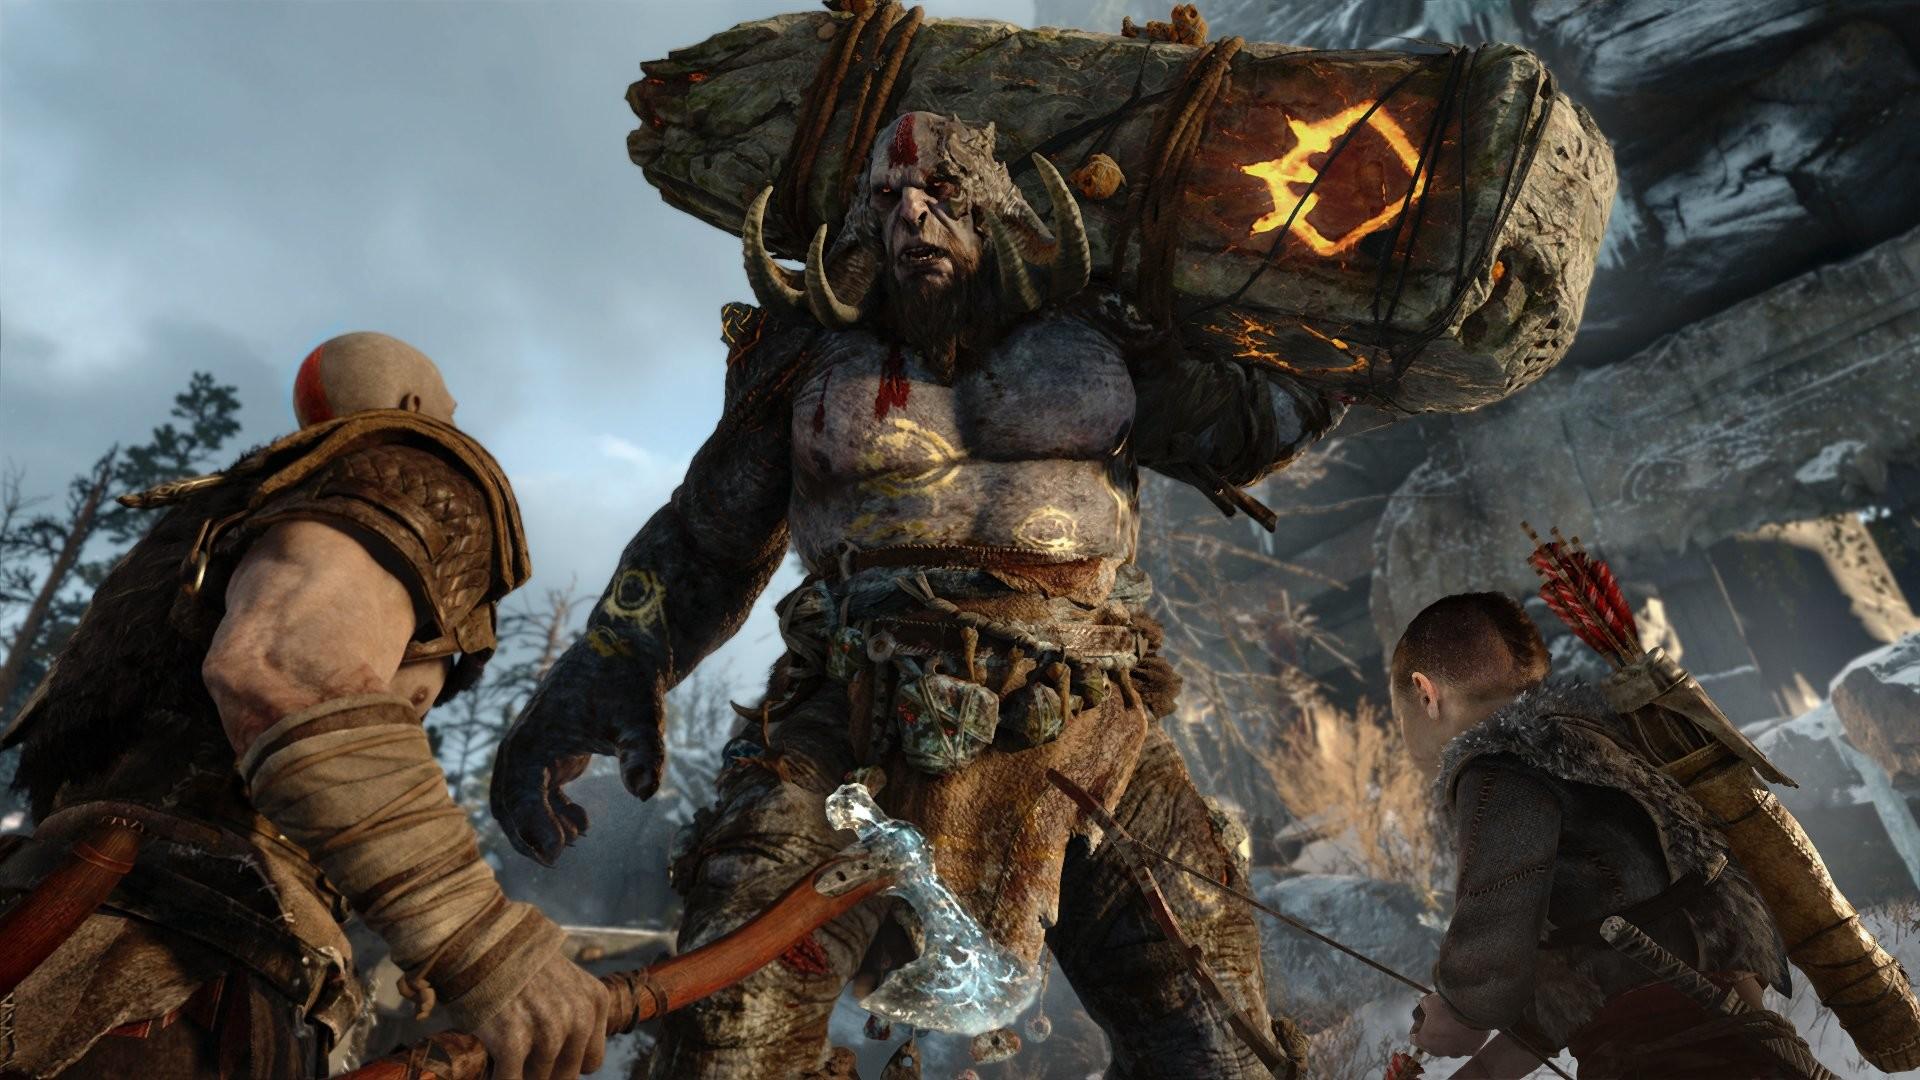 God Of War Wallpaper Hd Dekstop God Of War Ogre 699057